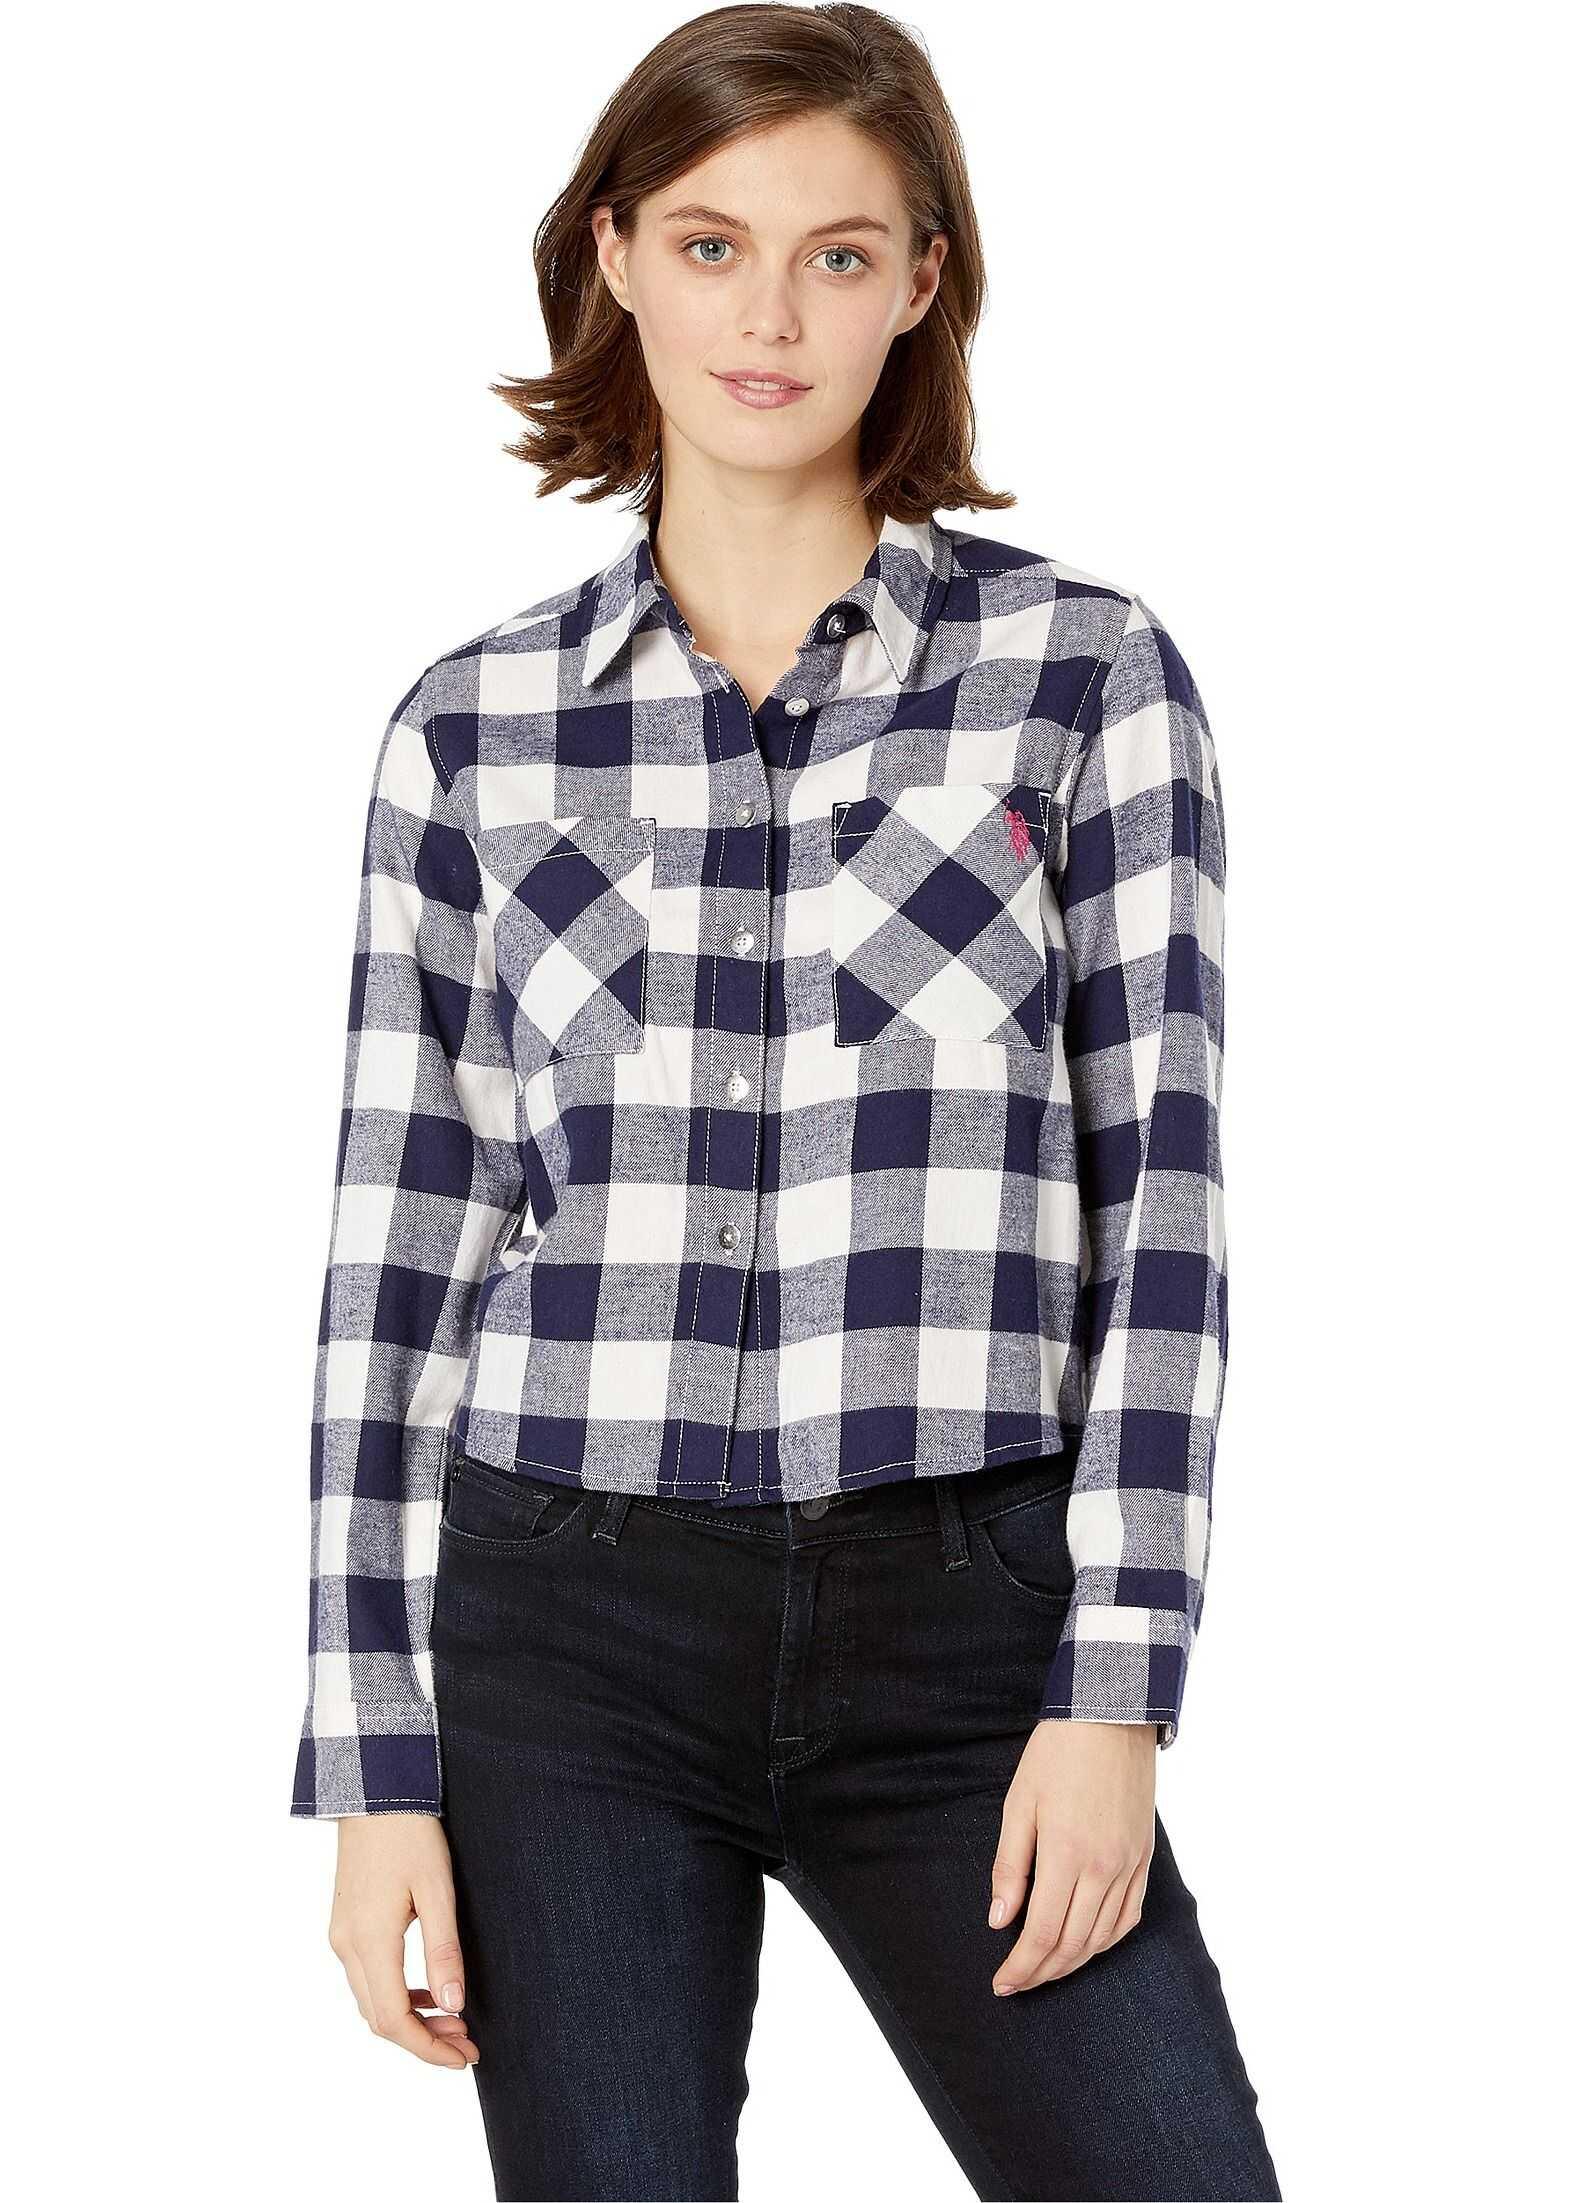 U.S. POLO ASSN. Flannel Shirt Buffalo Check/Ivory